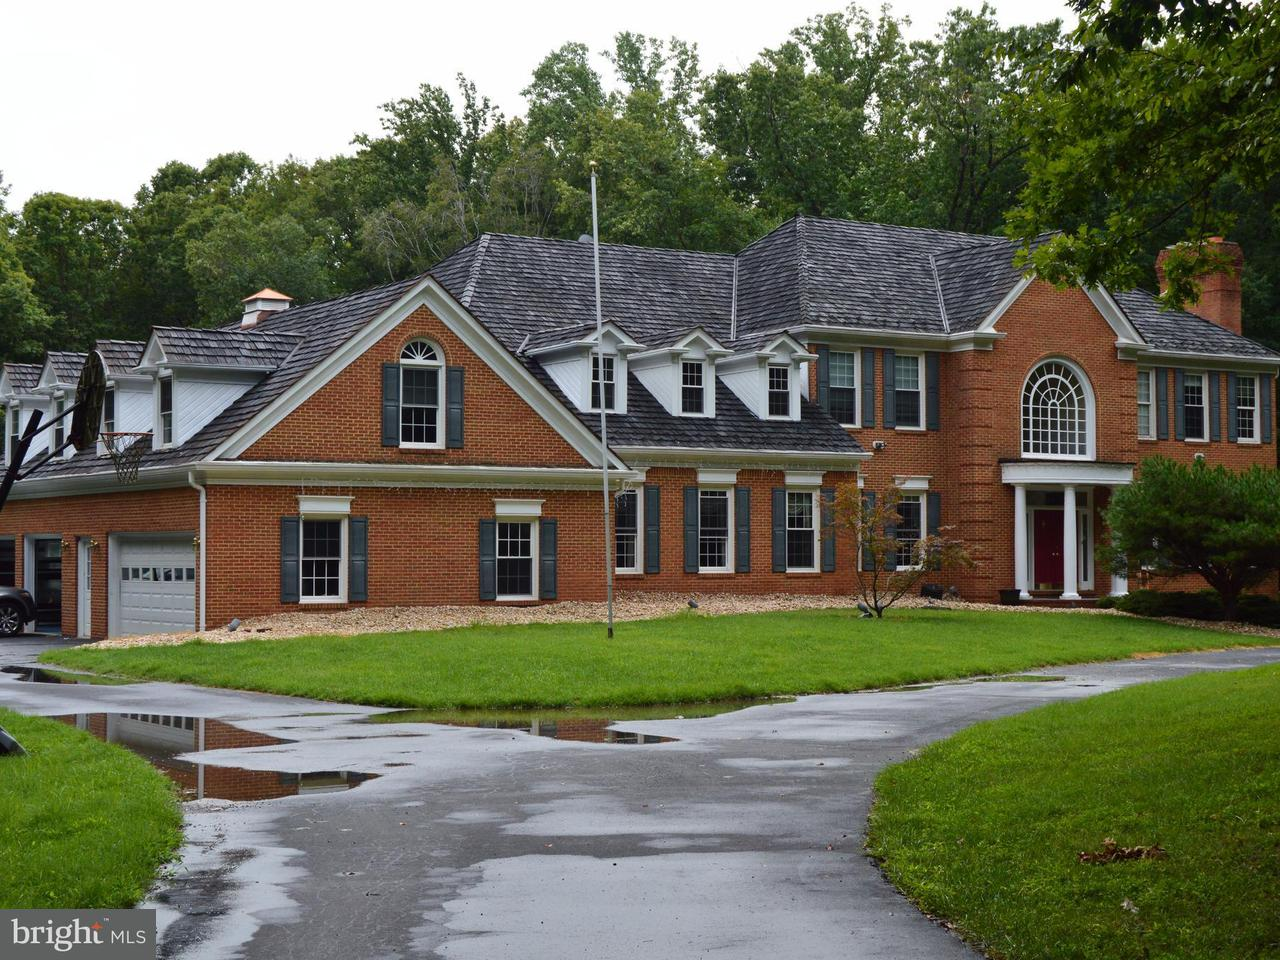 獨棟家庭住宅 為 出售 在 9811 Hampton Road 9811 Hampton Road Fairfax Station, 弗吉尼亞州 22039 美國